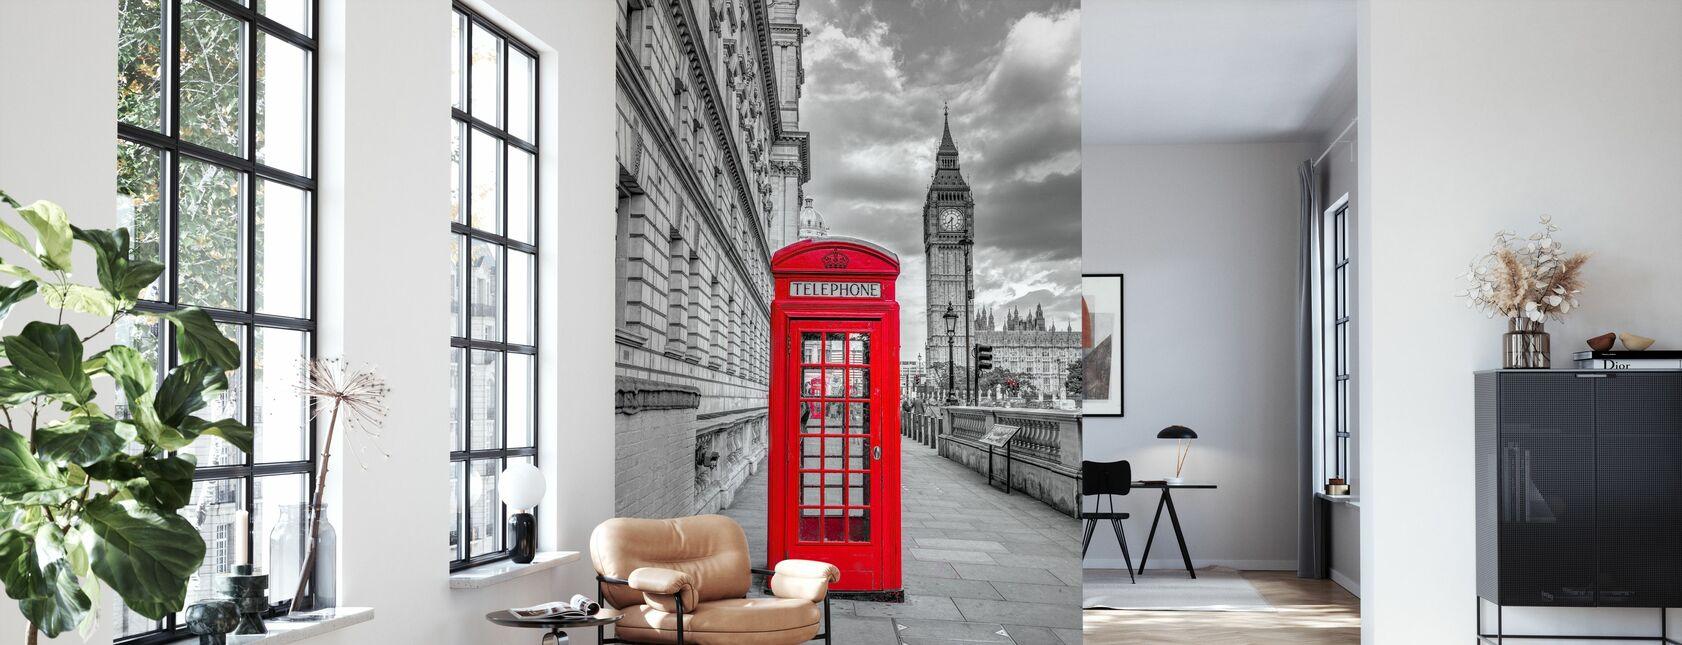 London Phone Booth - Wallpaper - Living Room